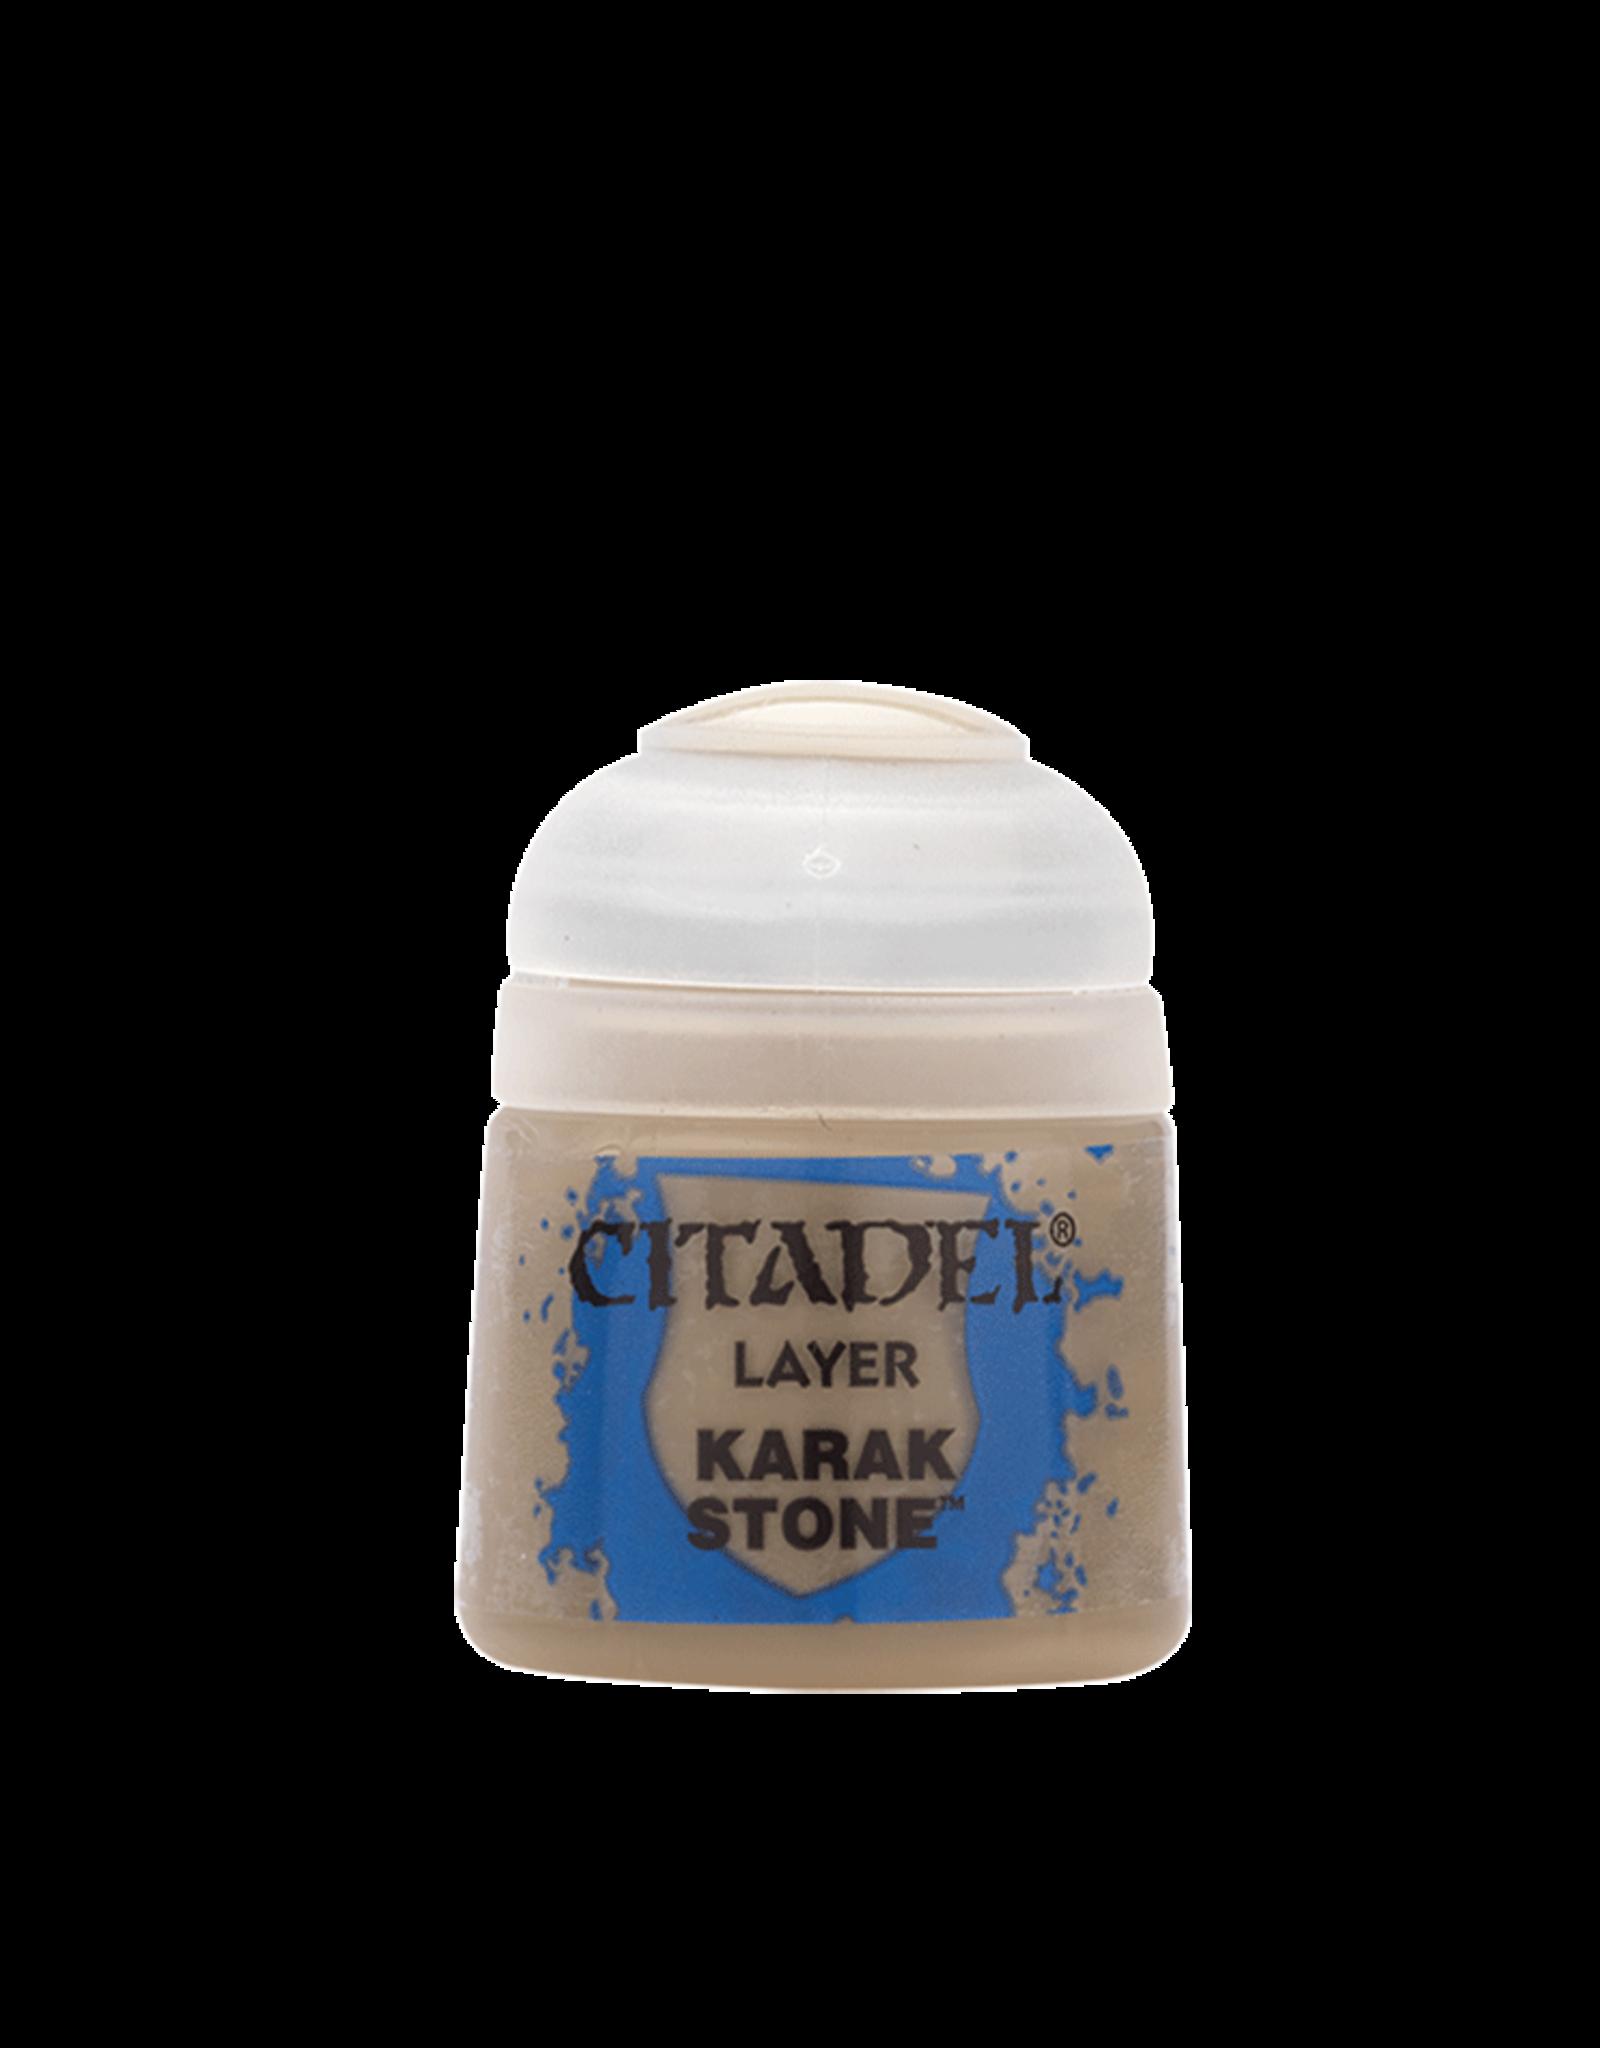 Citadel Citadel Layer: Karak Stone (12ml)